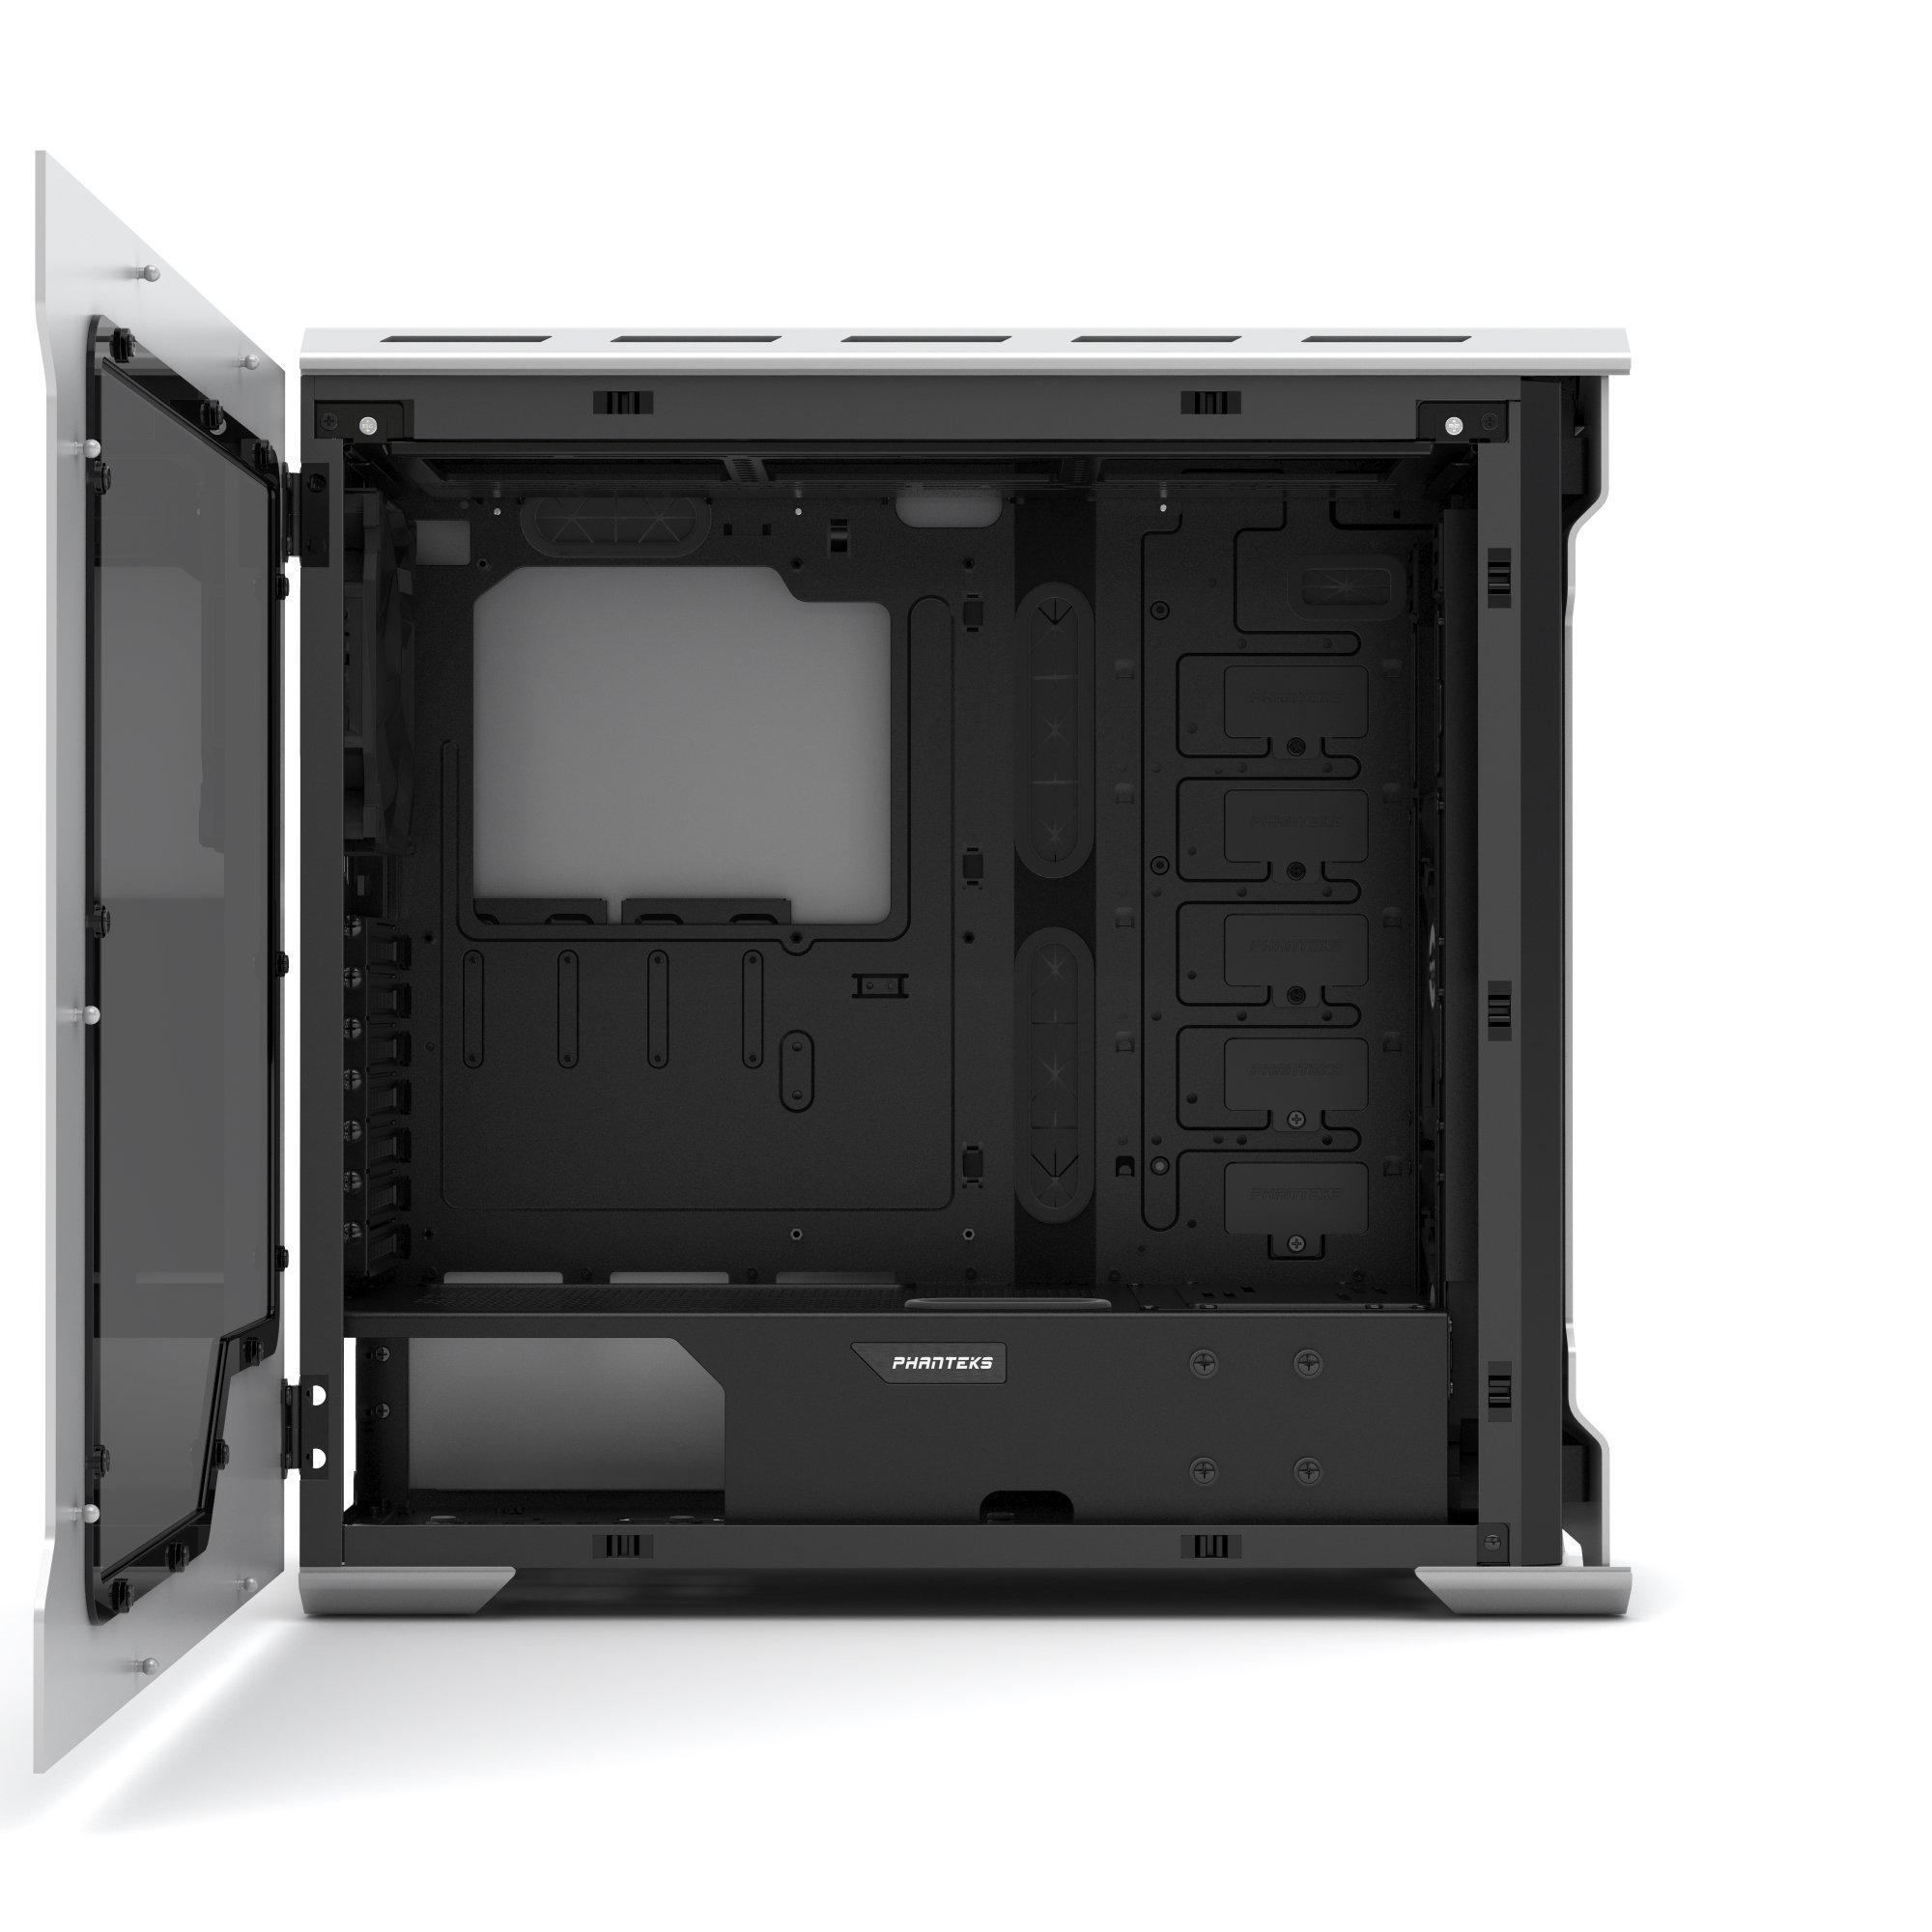 Phanteks Enthoo Evolv ATX Alum/Steel Tower Computer Case, Window (PH-ES515E_GS) Galaxy Silver by Phanteks (Image #6)